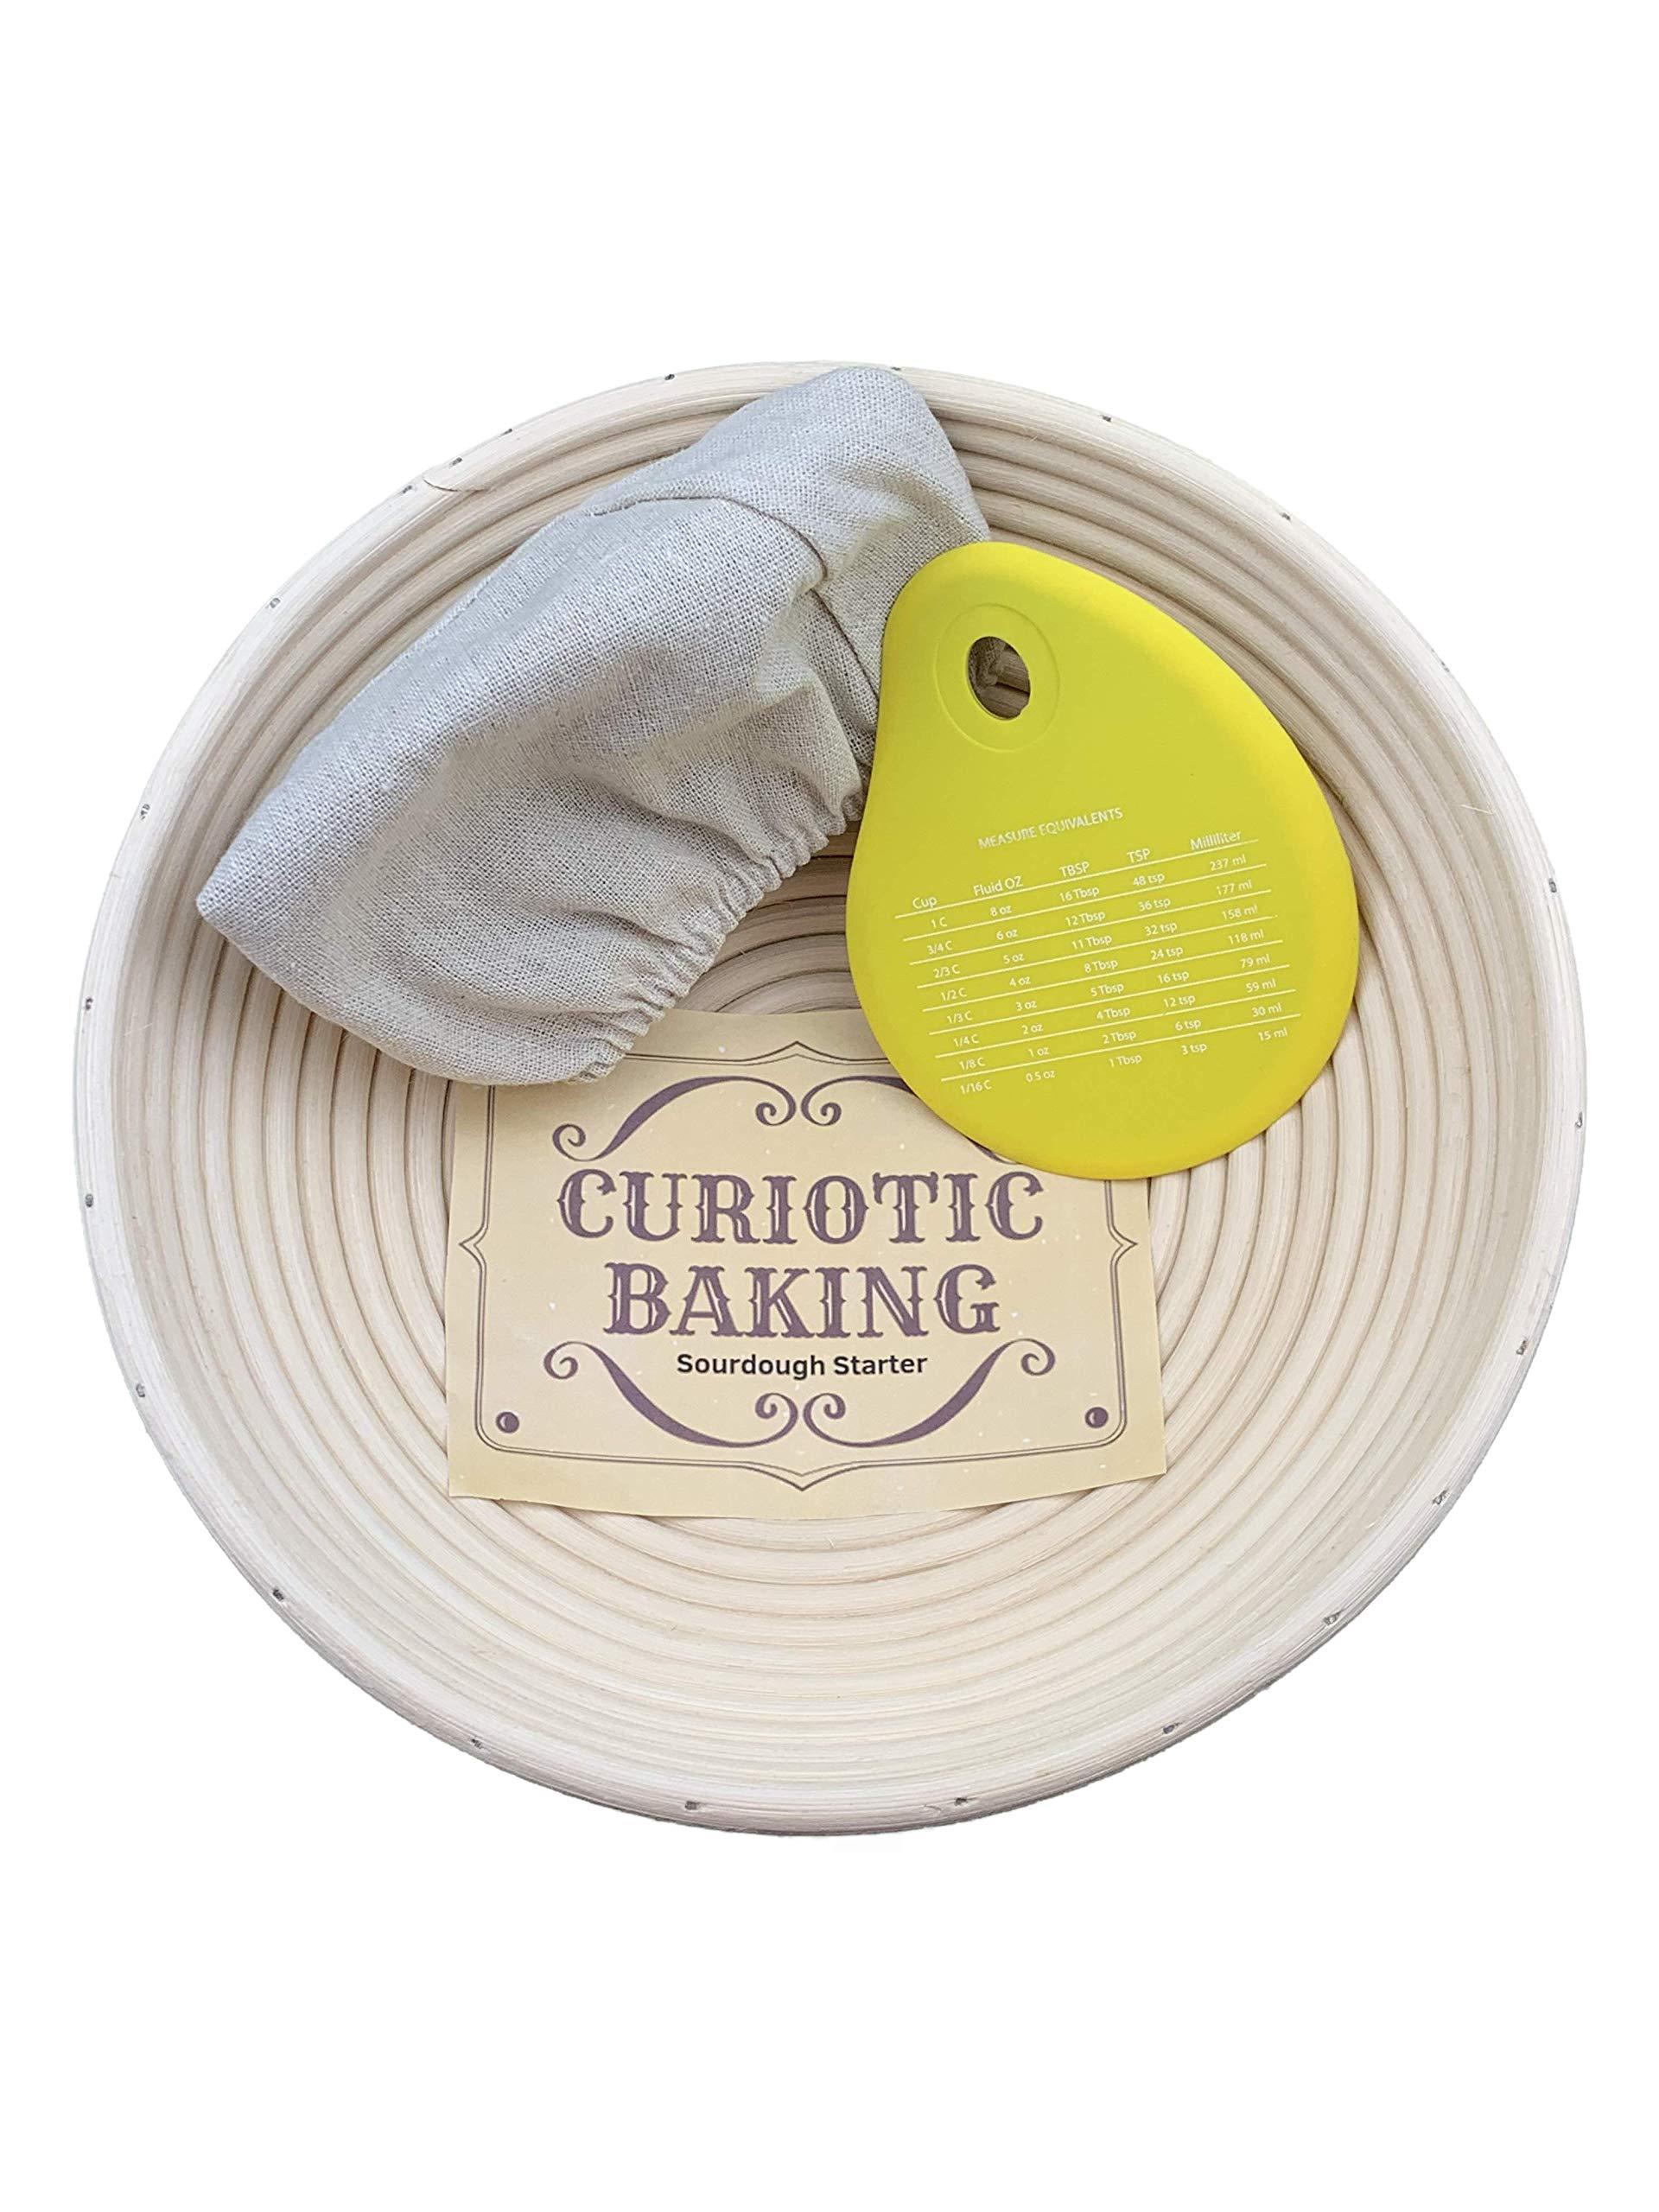 Banneton Proofing Bread Basket w/Silicone Bowl Scraper & Liner for Sourdough Starter - 10'' inch Professional & Home Proofing Basket - Brotform Bread Bowl - Bread Proofing Basket